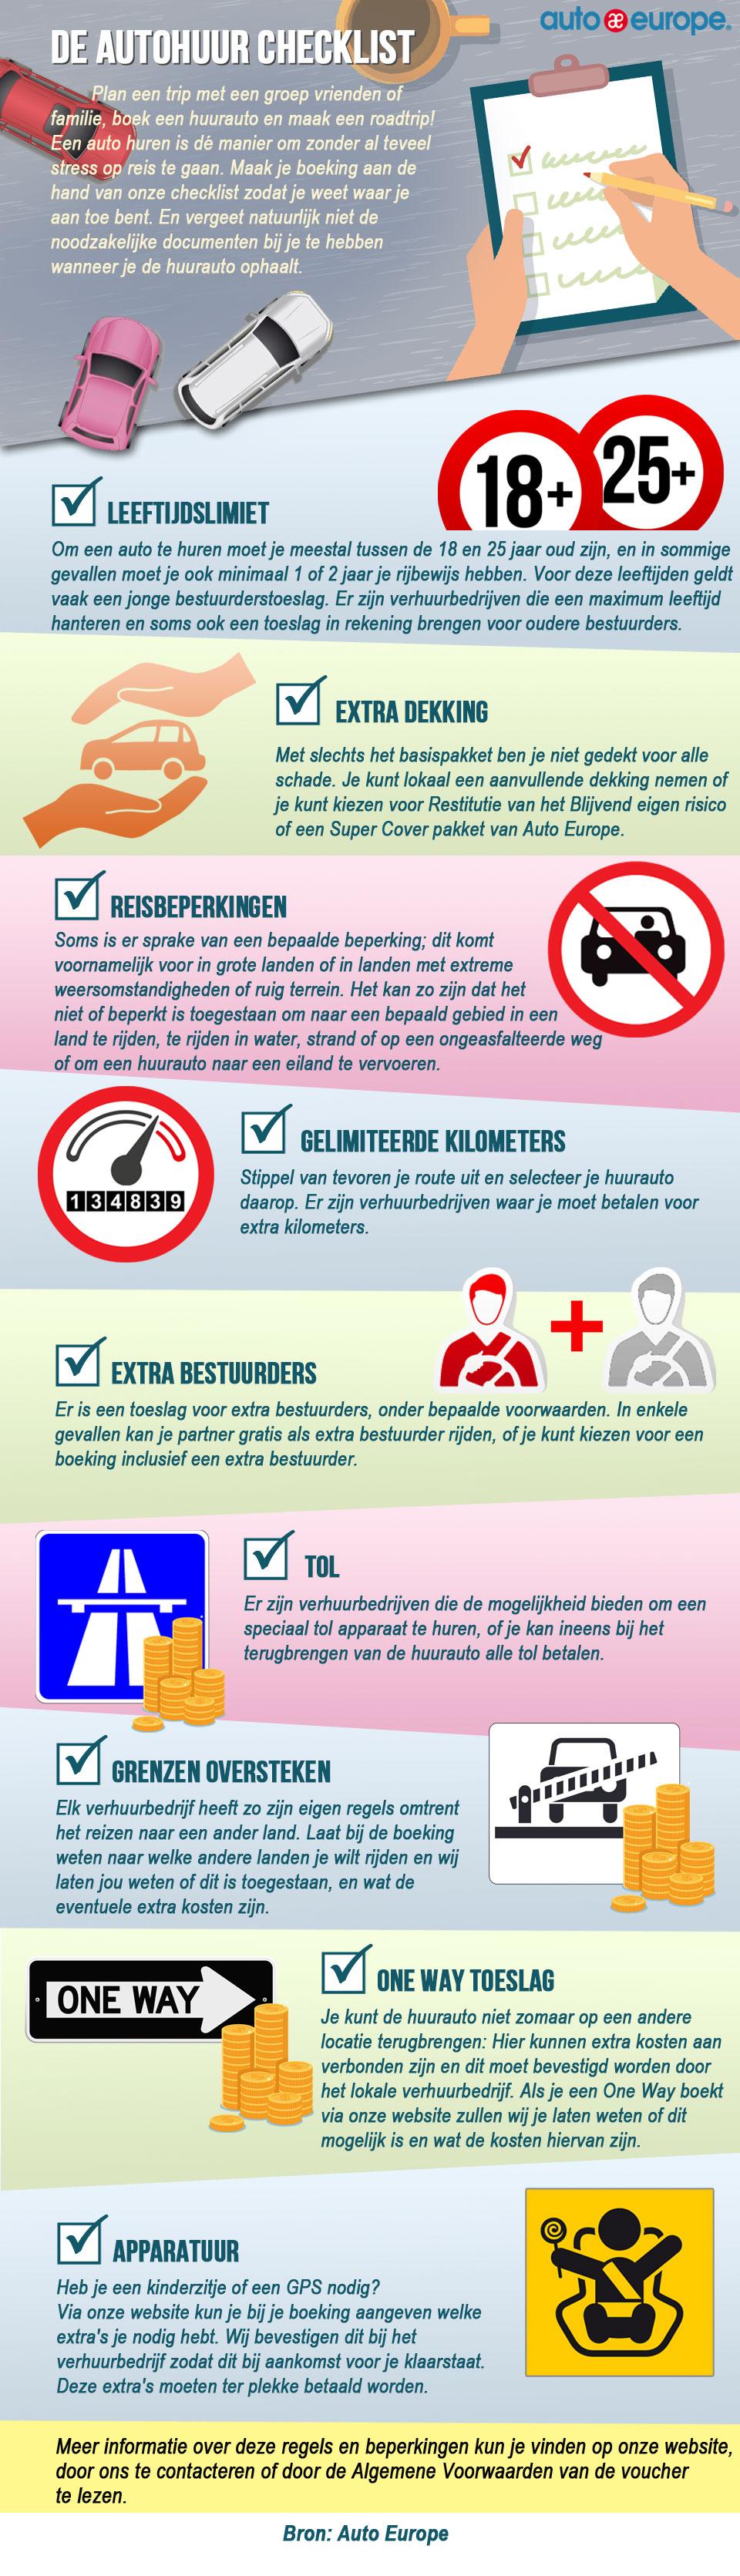 Checklist autohuur